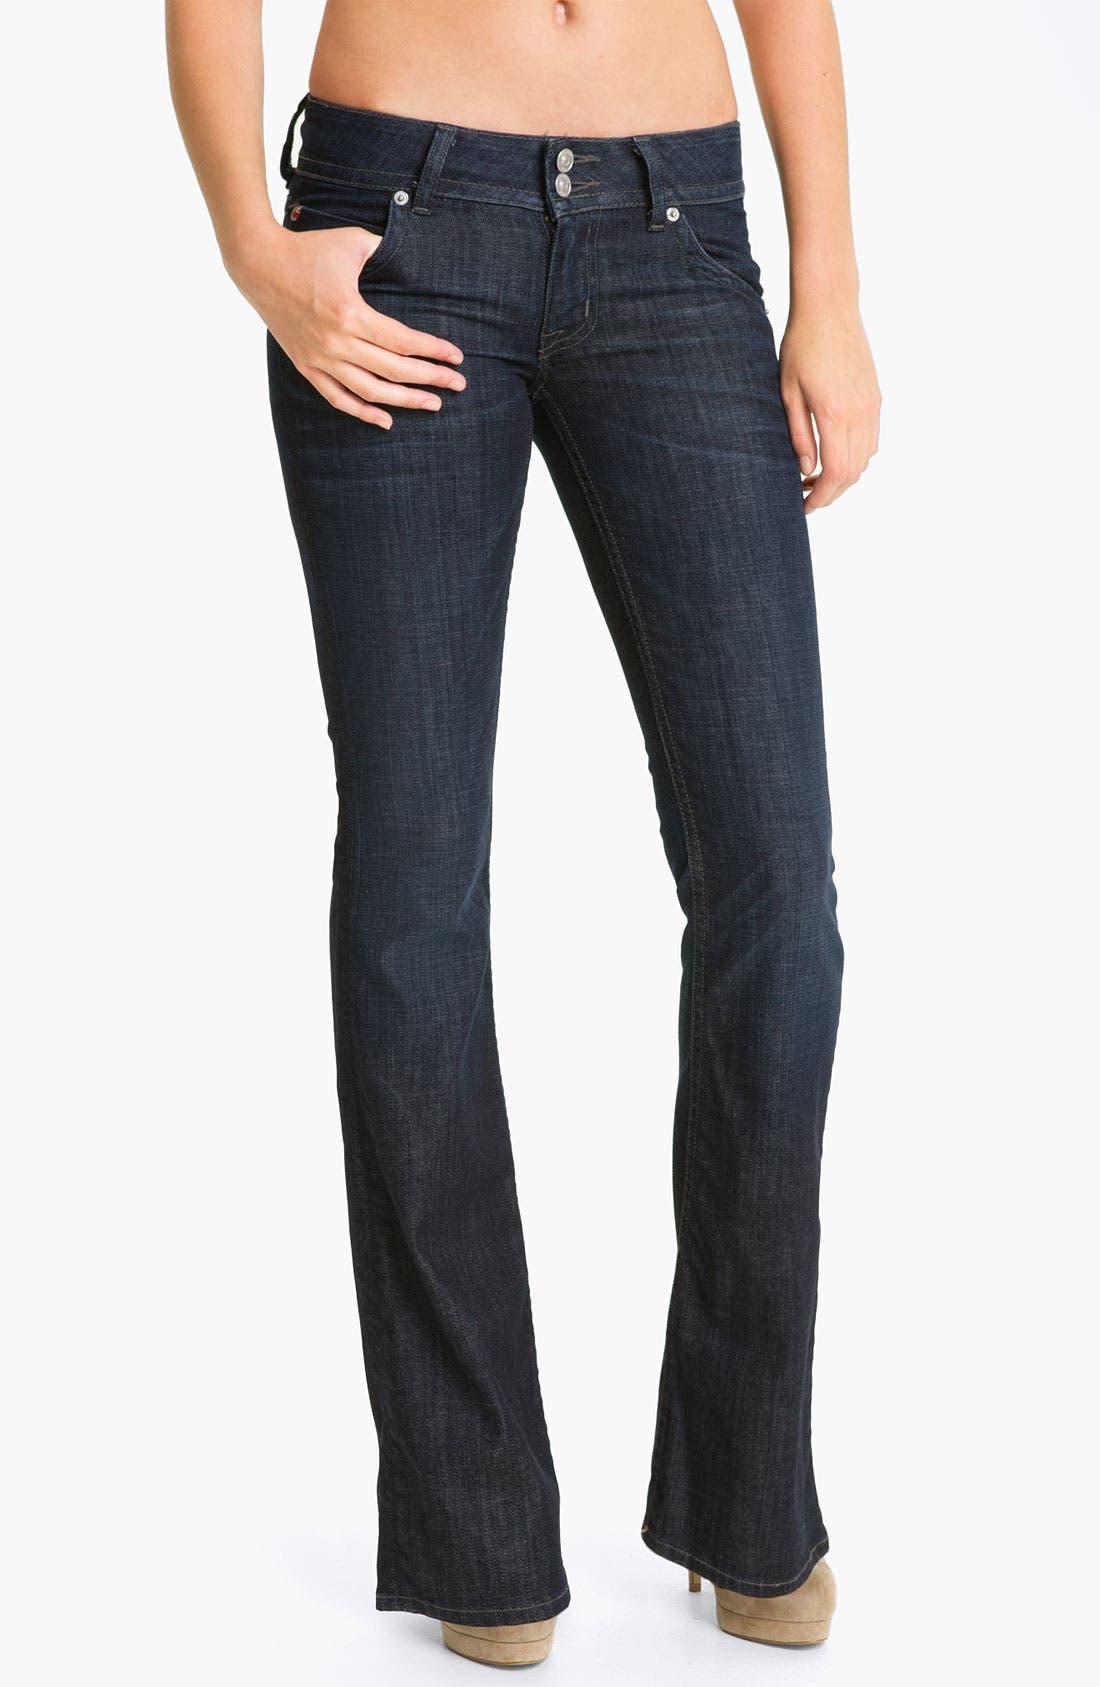 Main Image - Hudson Jeans Signature Flap Pocket Bootcut Jeans (Savage)